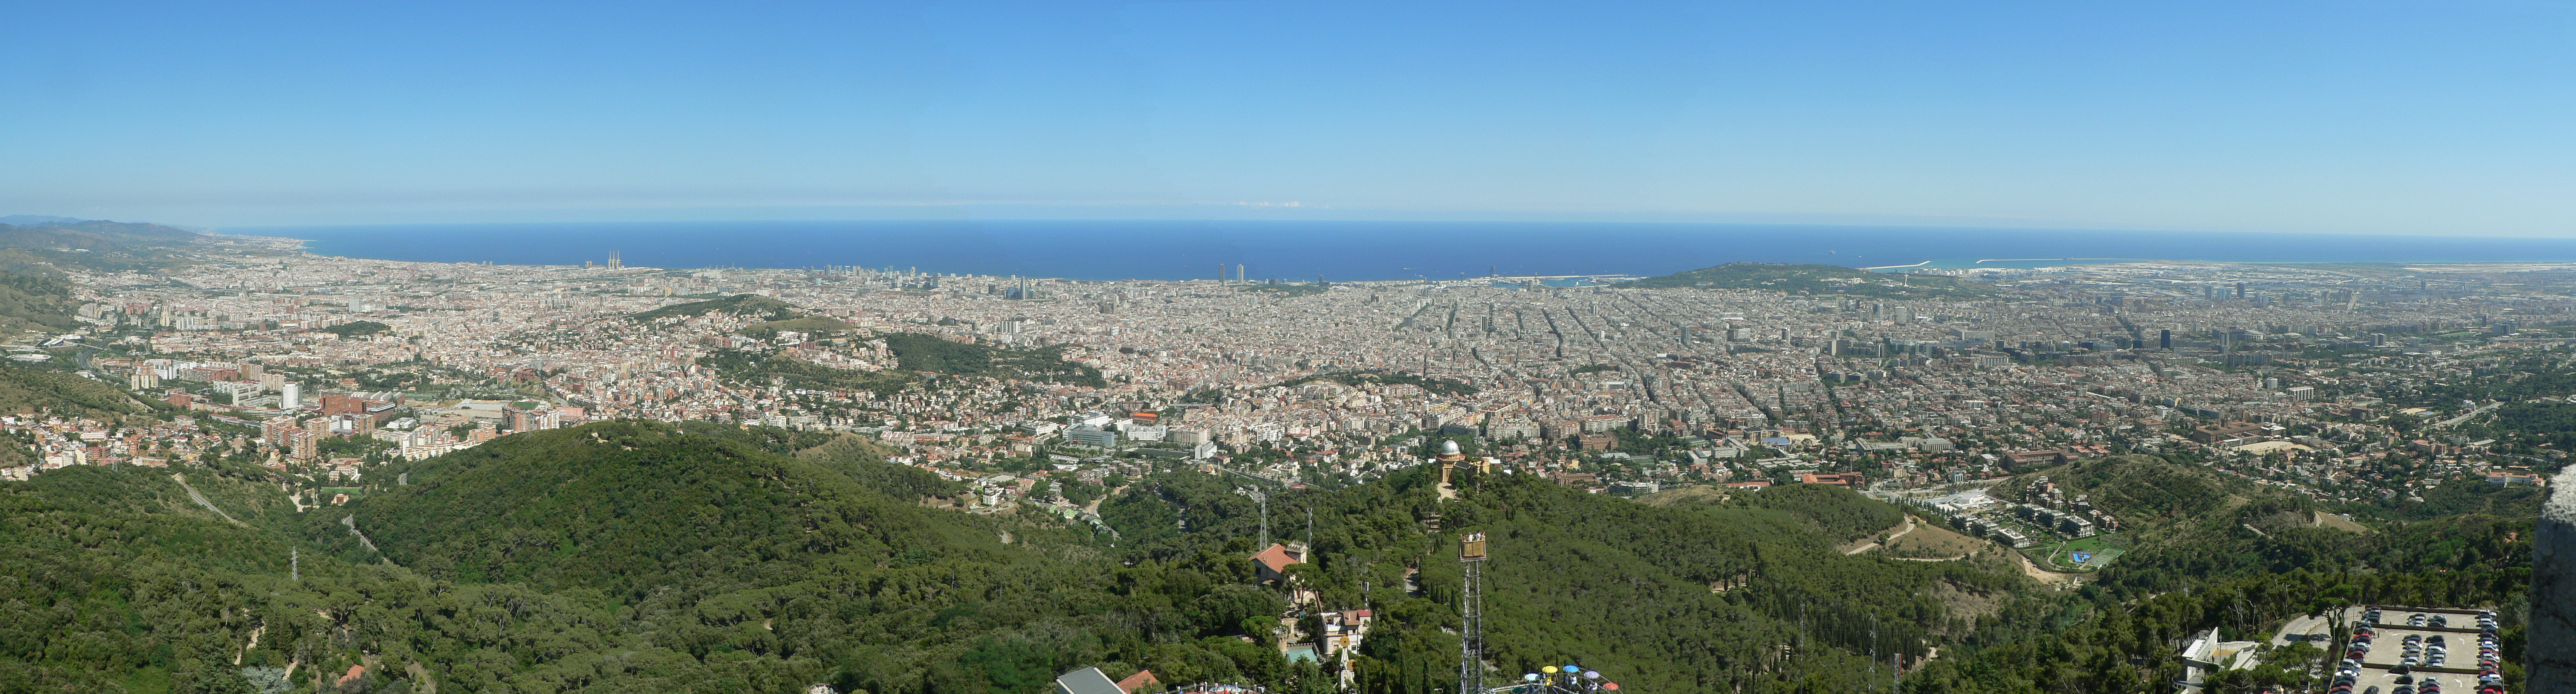 Description Barcelona. View from Tibidabo.jpg